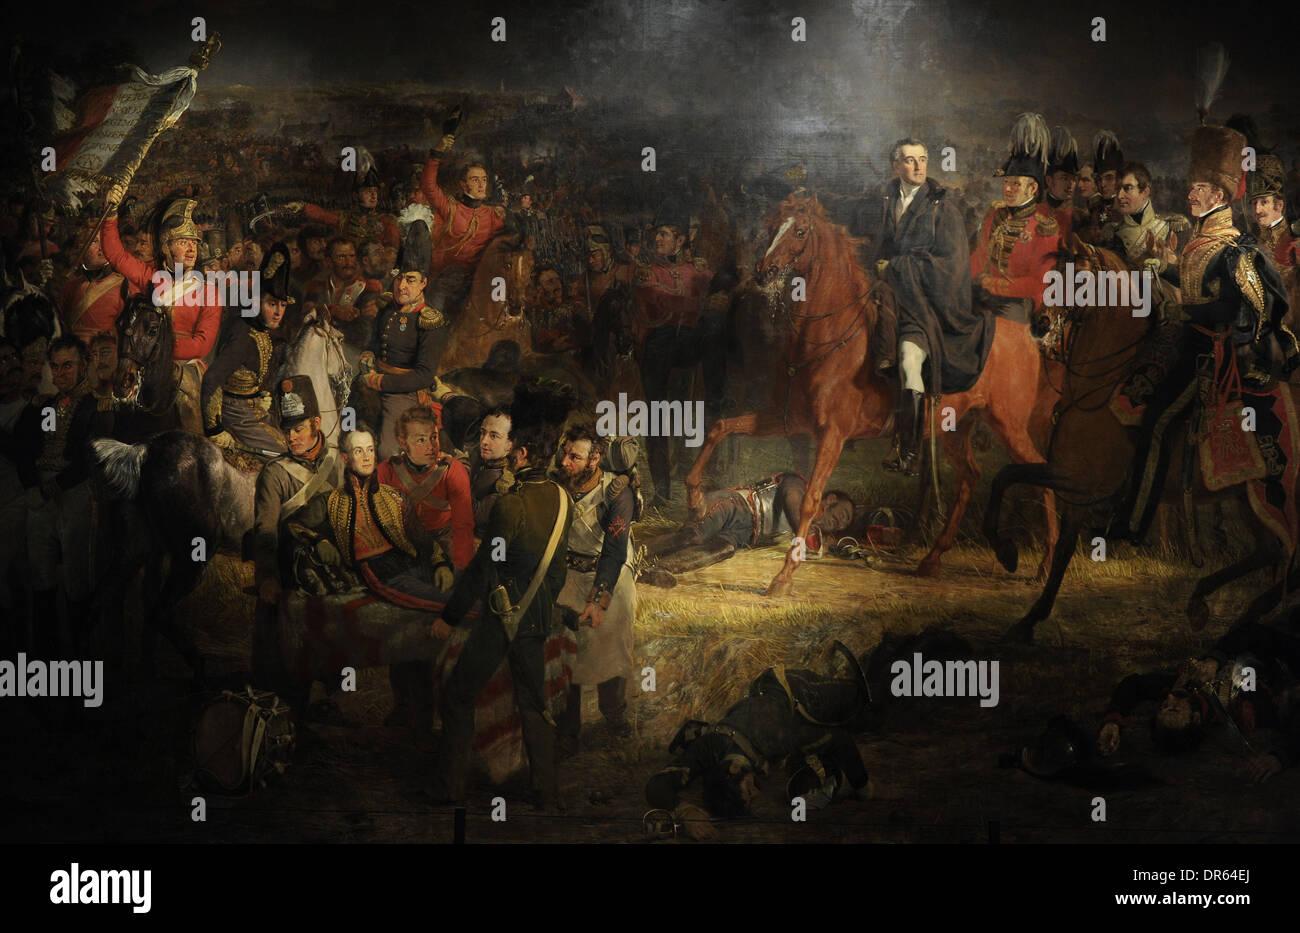 Jan Willem Pieneman (1779-1853). Dutch painter. The Battle of Waterloo, 1824. Rijksmuseum. Amsterdam. Netherlands. Stock Photo